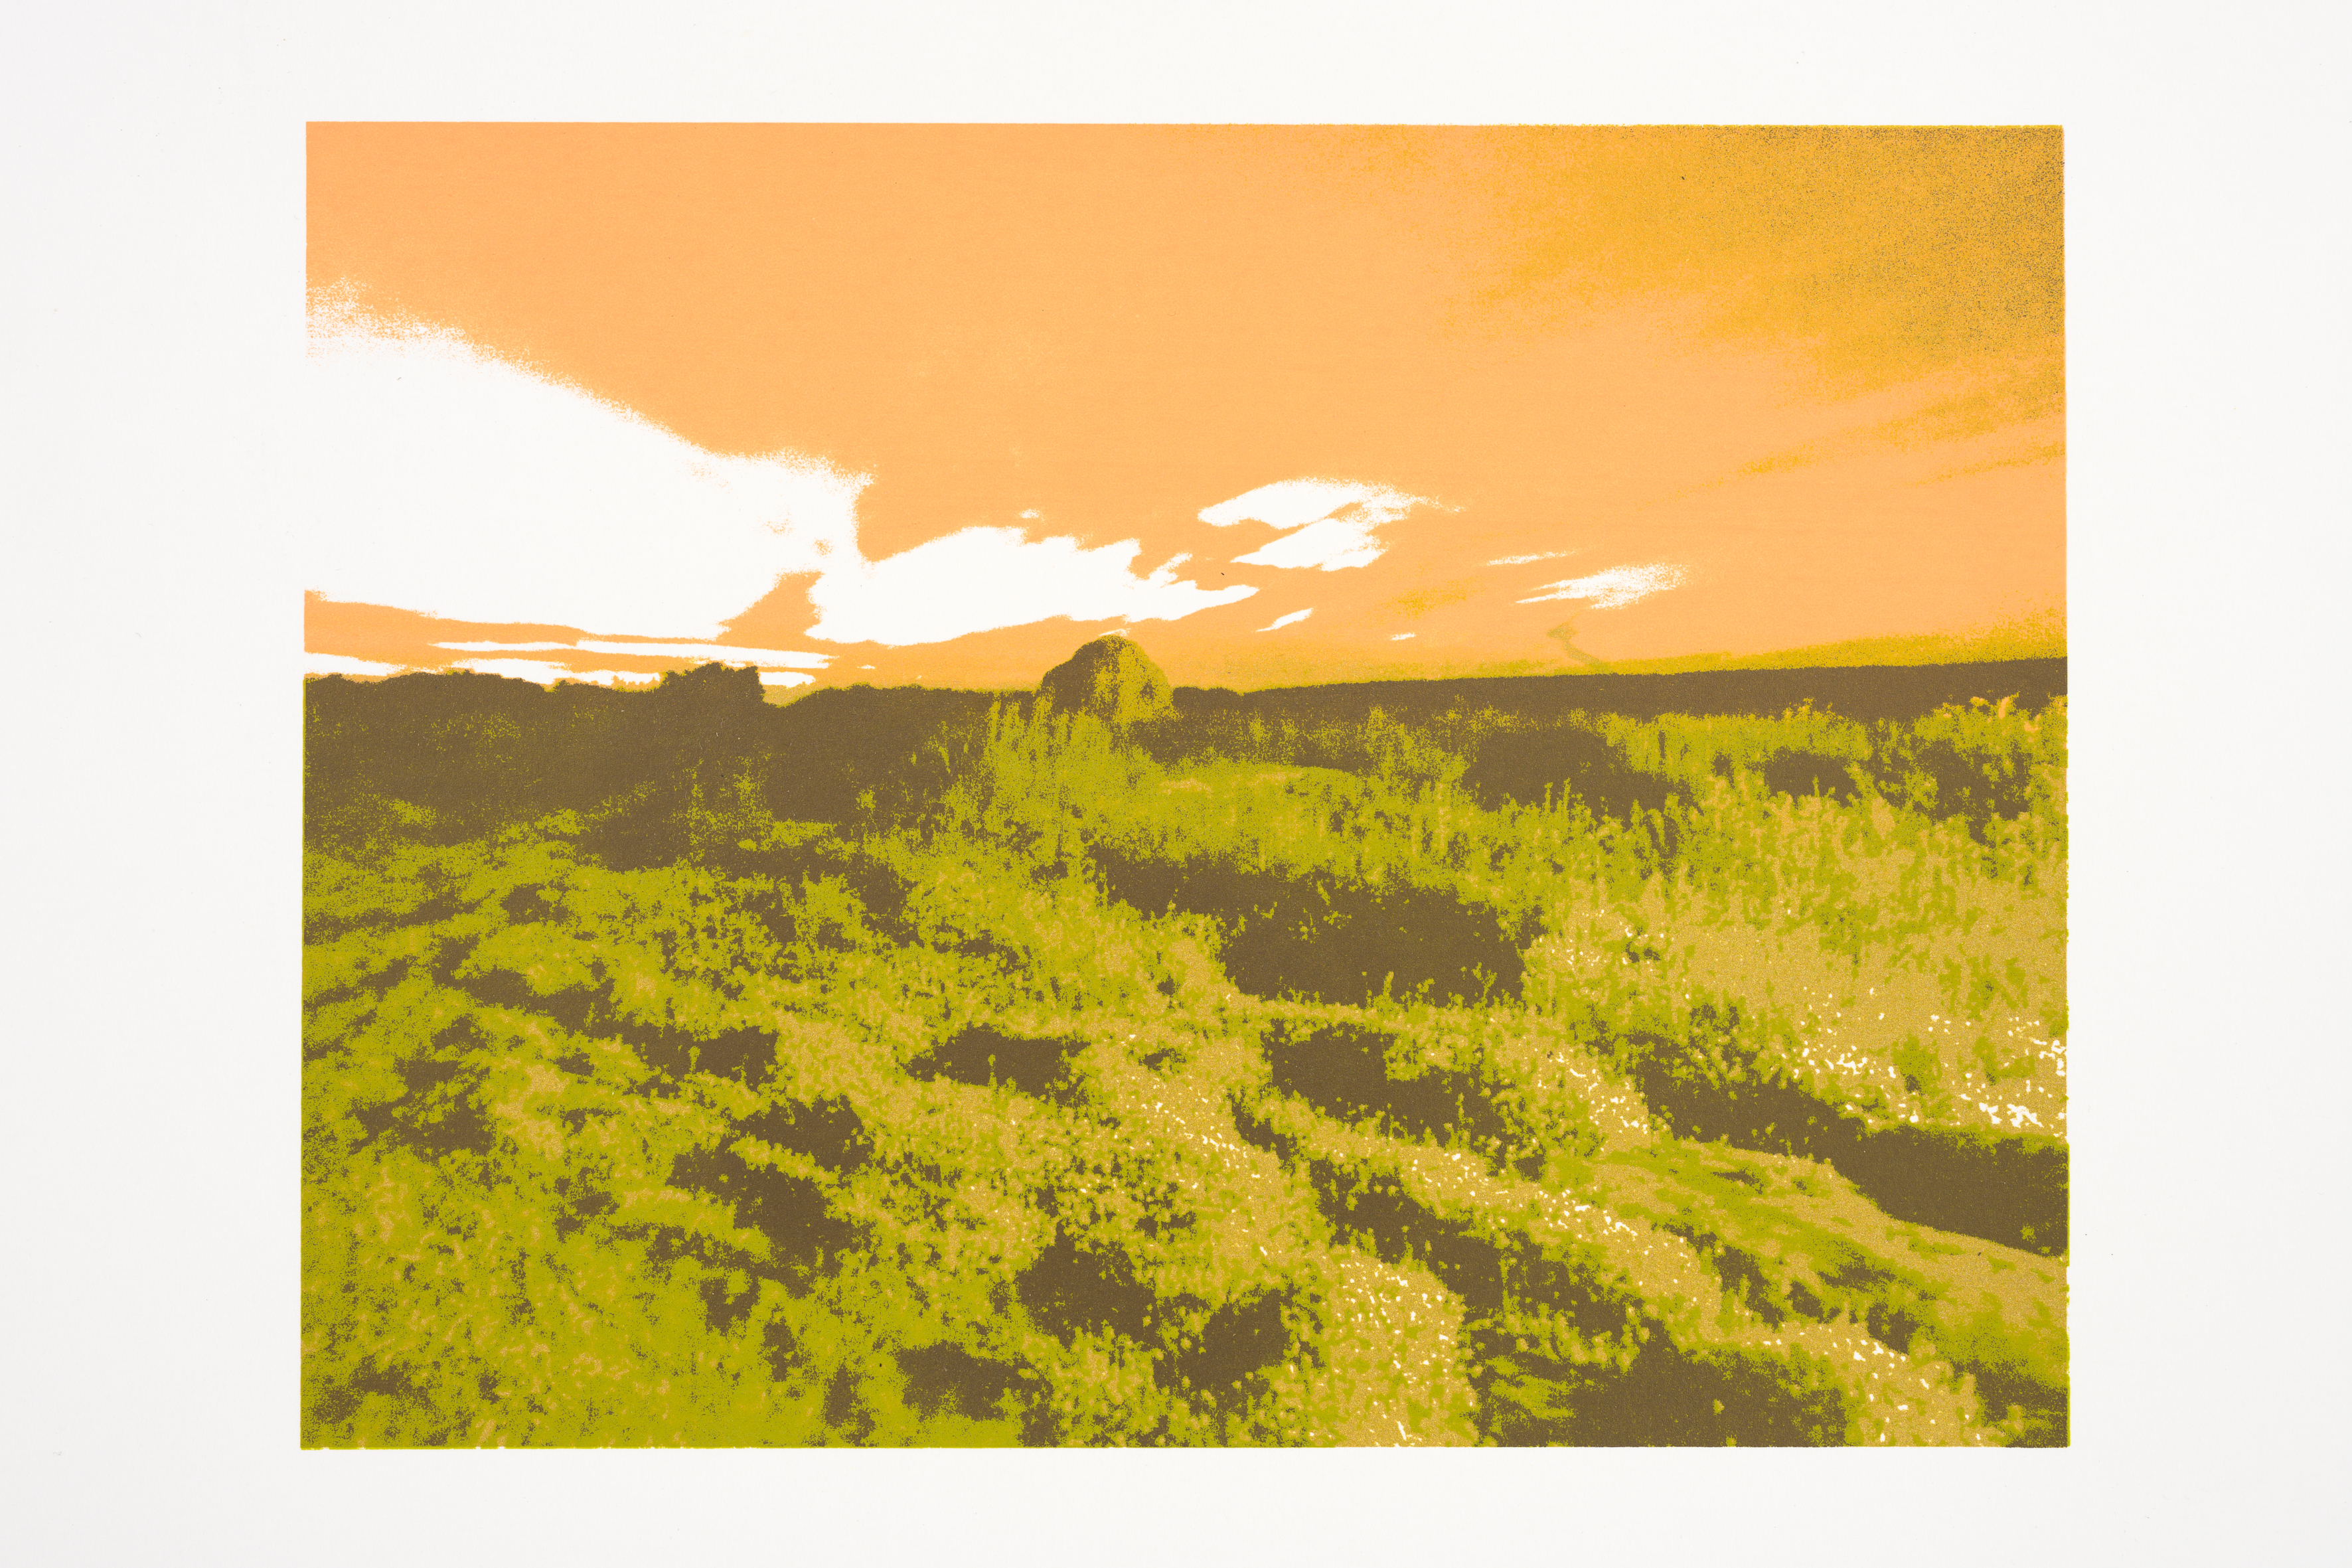 """Sun Down"" (2019), 24 x 37 cm., three color silkscreenprint (Printed at Beeldenstorm/Daglicht 2019)"